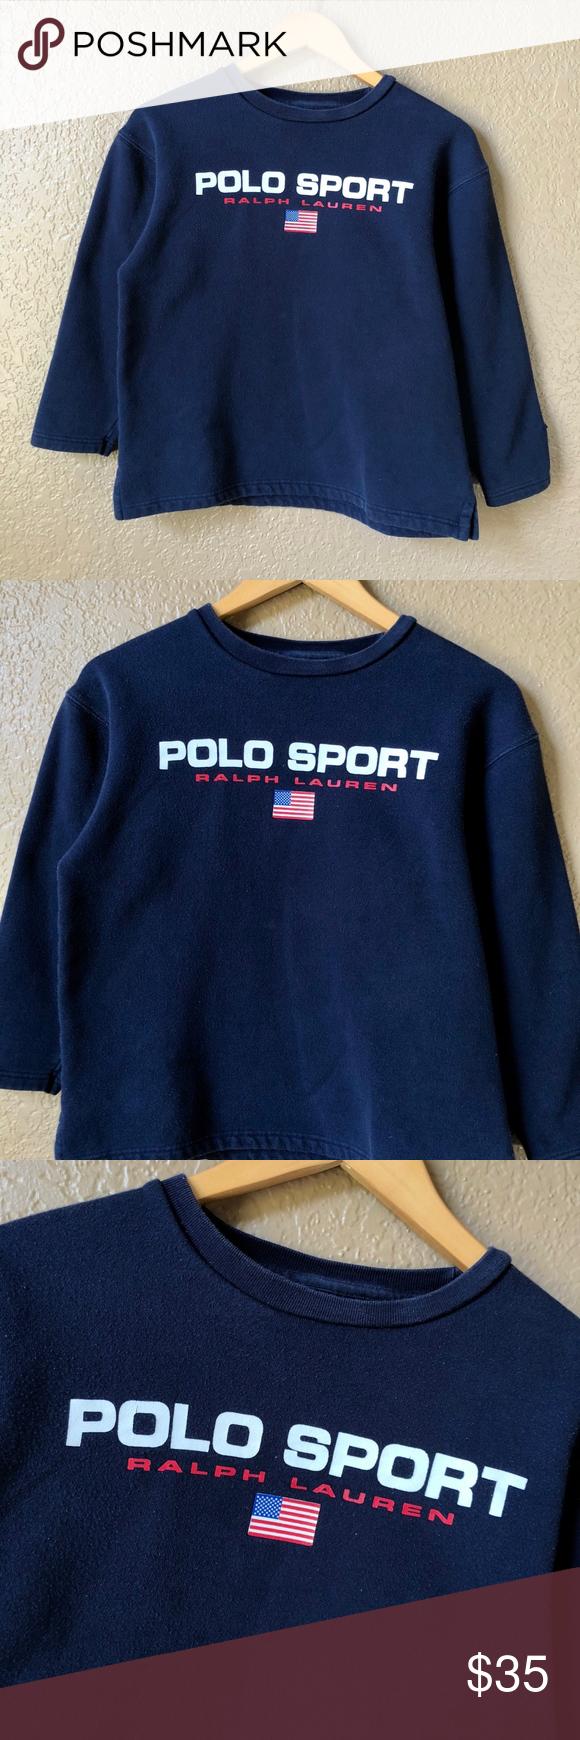 90s Polo Sport Ralph Lauren Flag Logo Crewneck Capital City Hype Is A Hand Curated Selection Of Stre Polo Sport Ralph Lauren Clothes Design Sweaters Crewneck